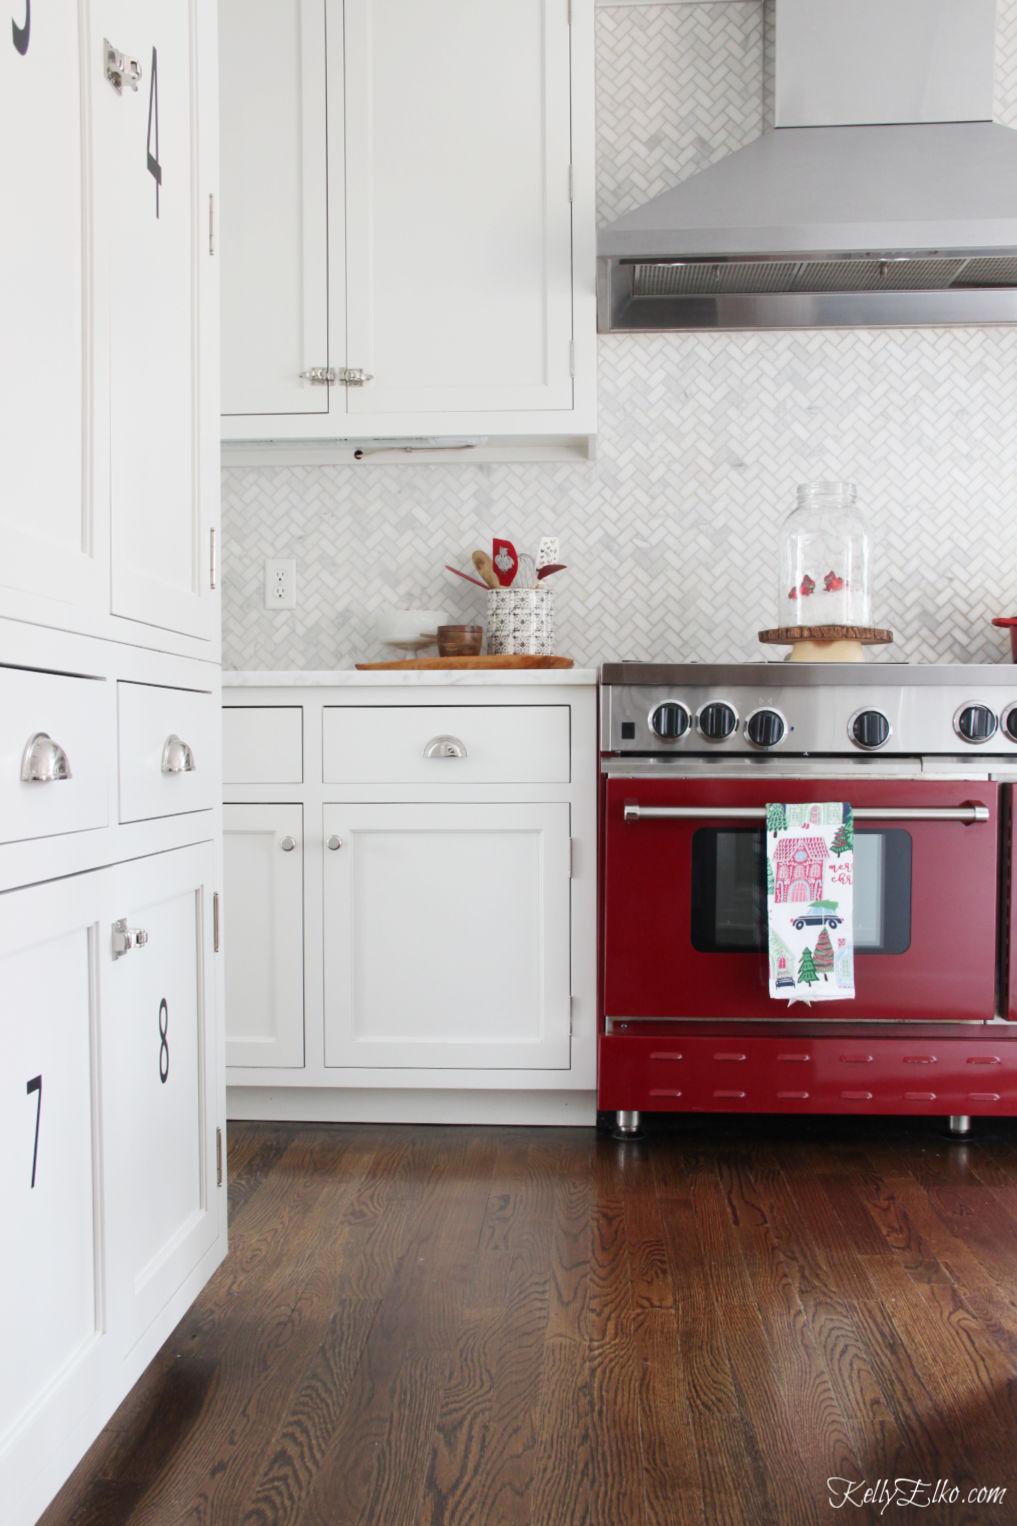 Beautiful white kitchen with red stove, carrara herringbone tile and white cabinets kellyelko.com #christmas #christmasdecor #christmasdecorating #christmashome #christmastour #diychristmas #christmasideas #christmasmantel #christmastree #christmasornaments #vintagechristmas #farmhousechristmas #colorfulchristmas #creativechristmas #kellyelko #redstove #stove #backsplash #whitekitchen